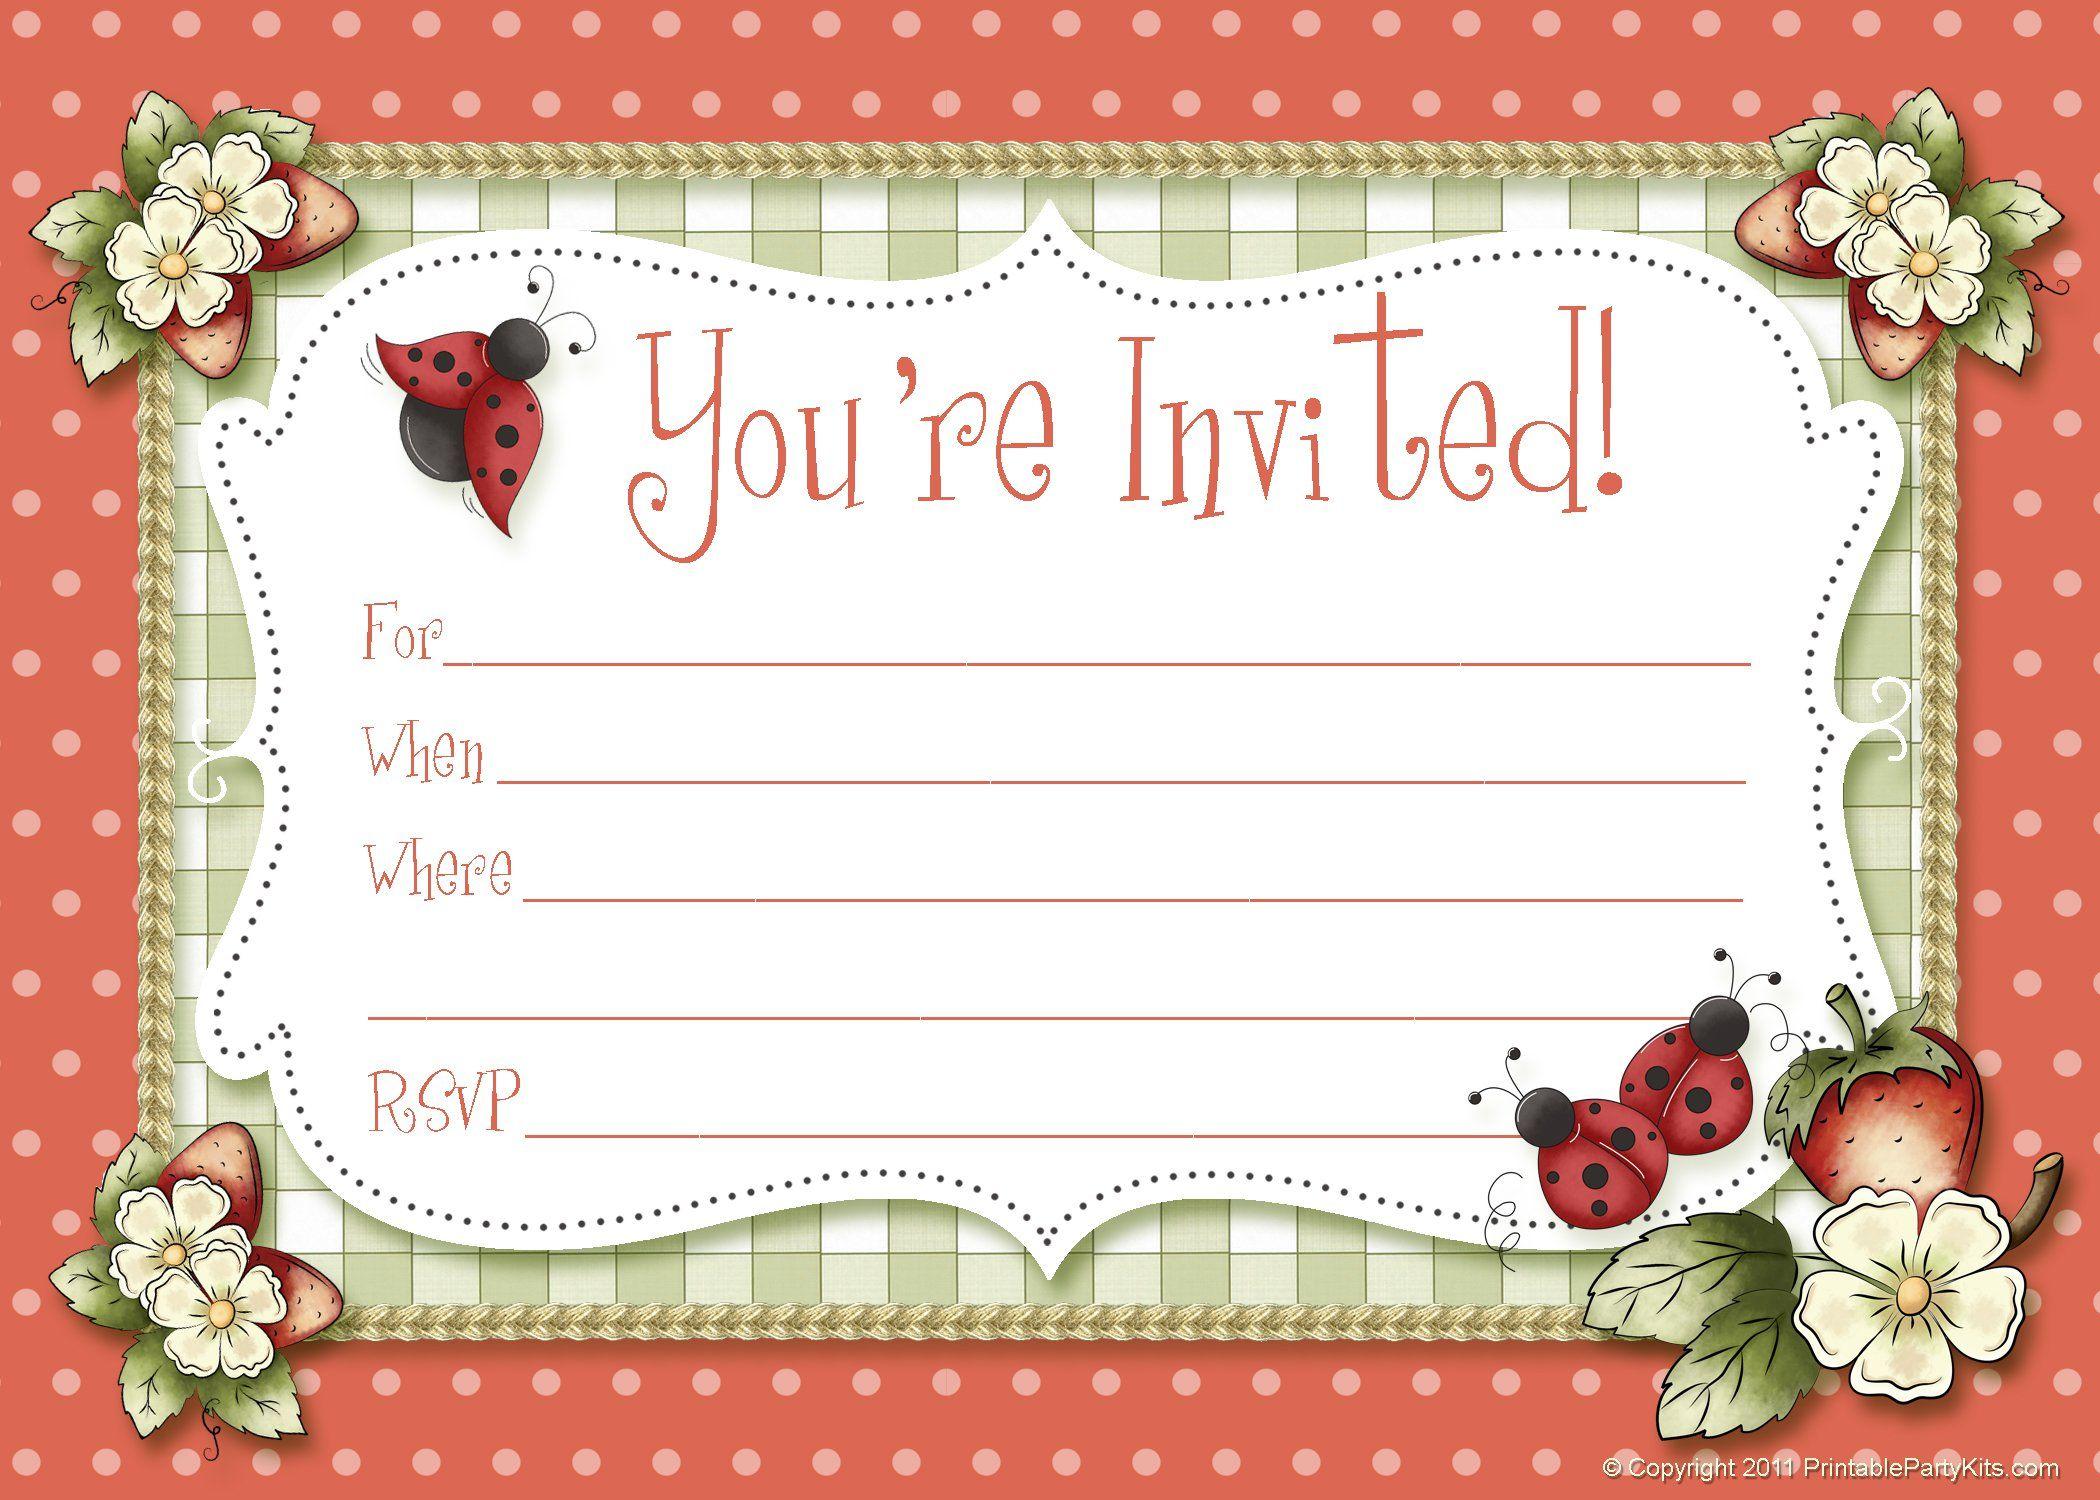 birthday invitation maker with photo - Create Birthday Party Invitations